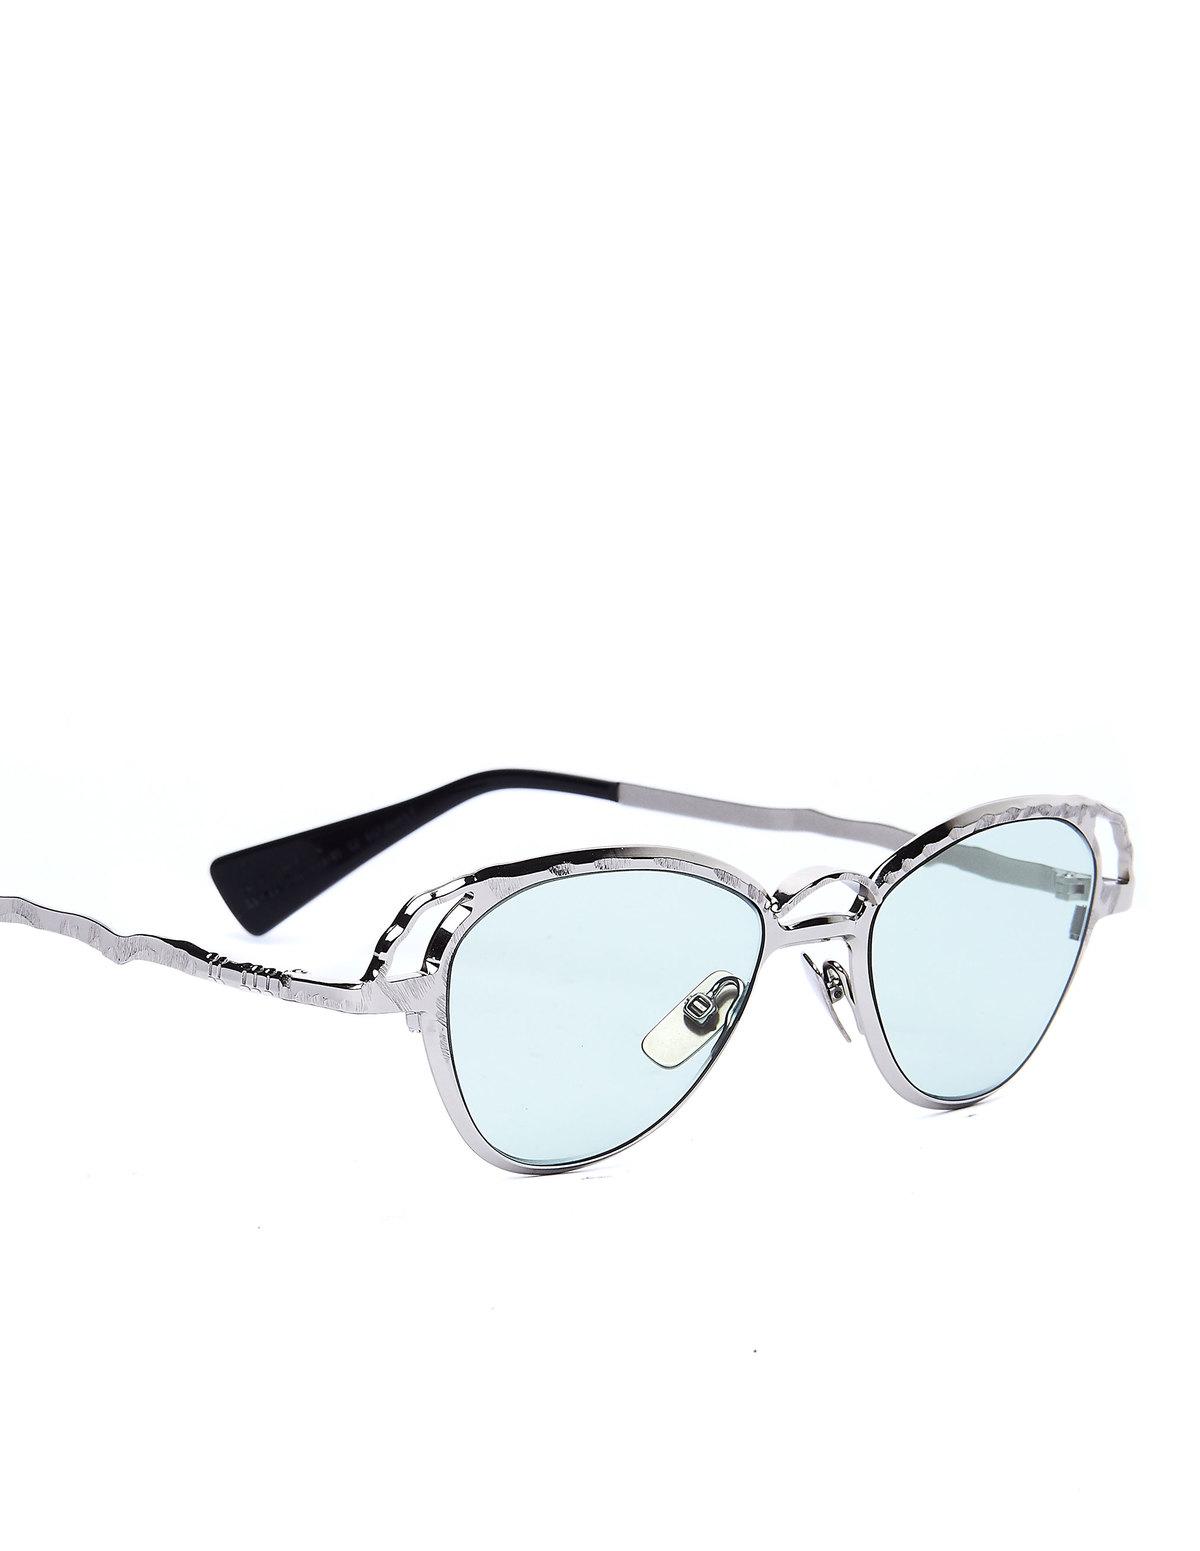 04021f476375 Kuboraum Mask Z16 Sunglasses - Silver